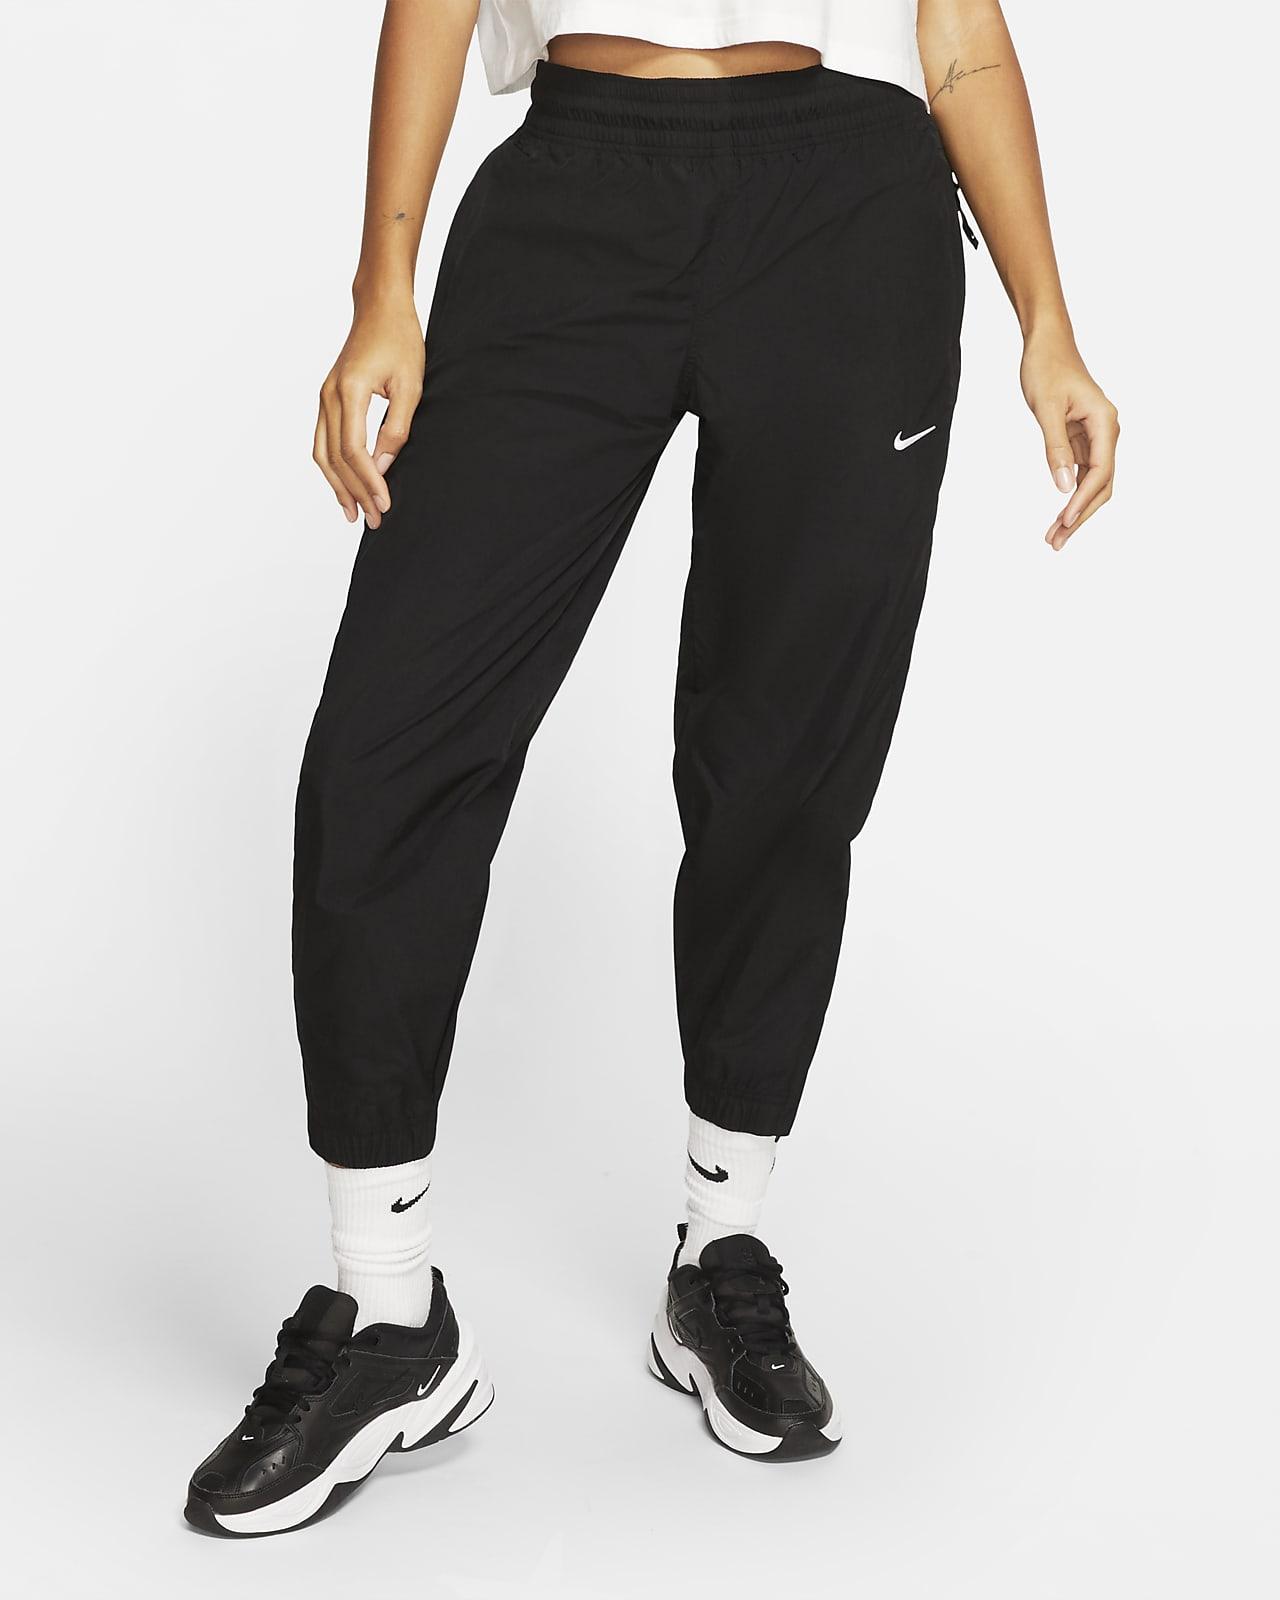 Nike Women's Tracksuit Bottoms